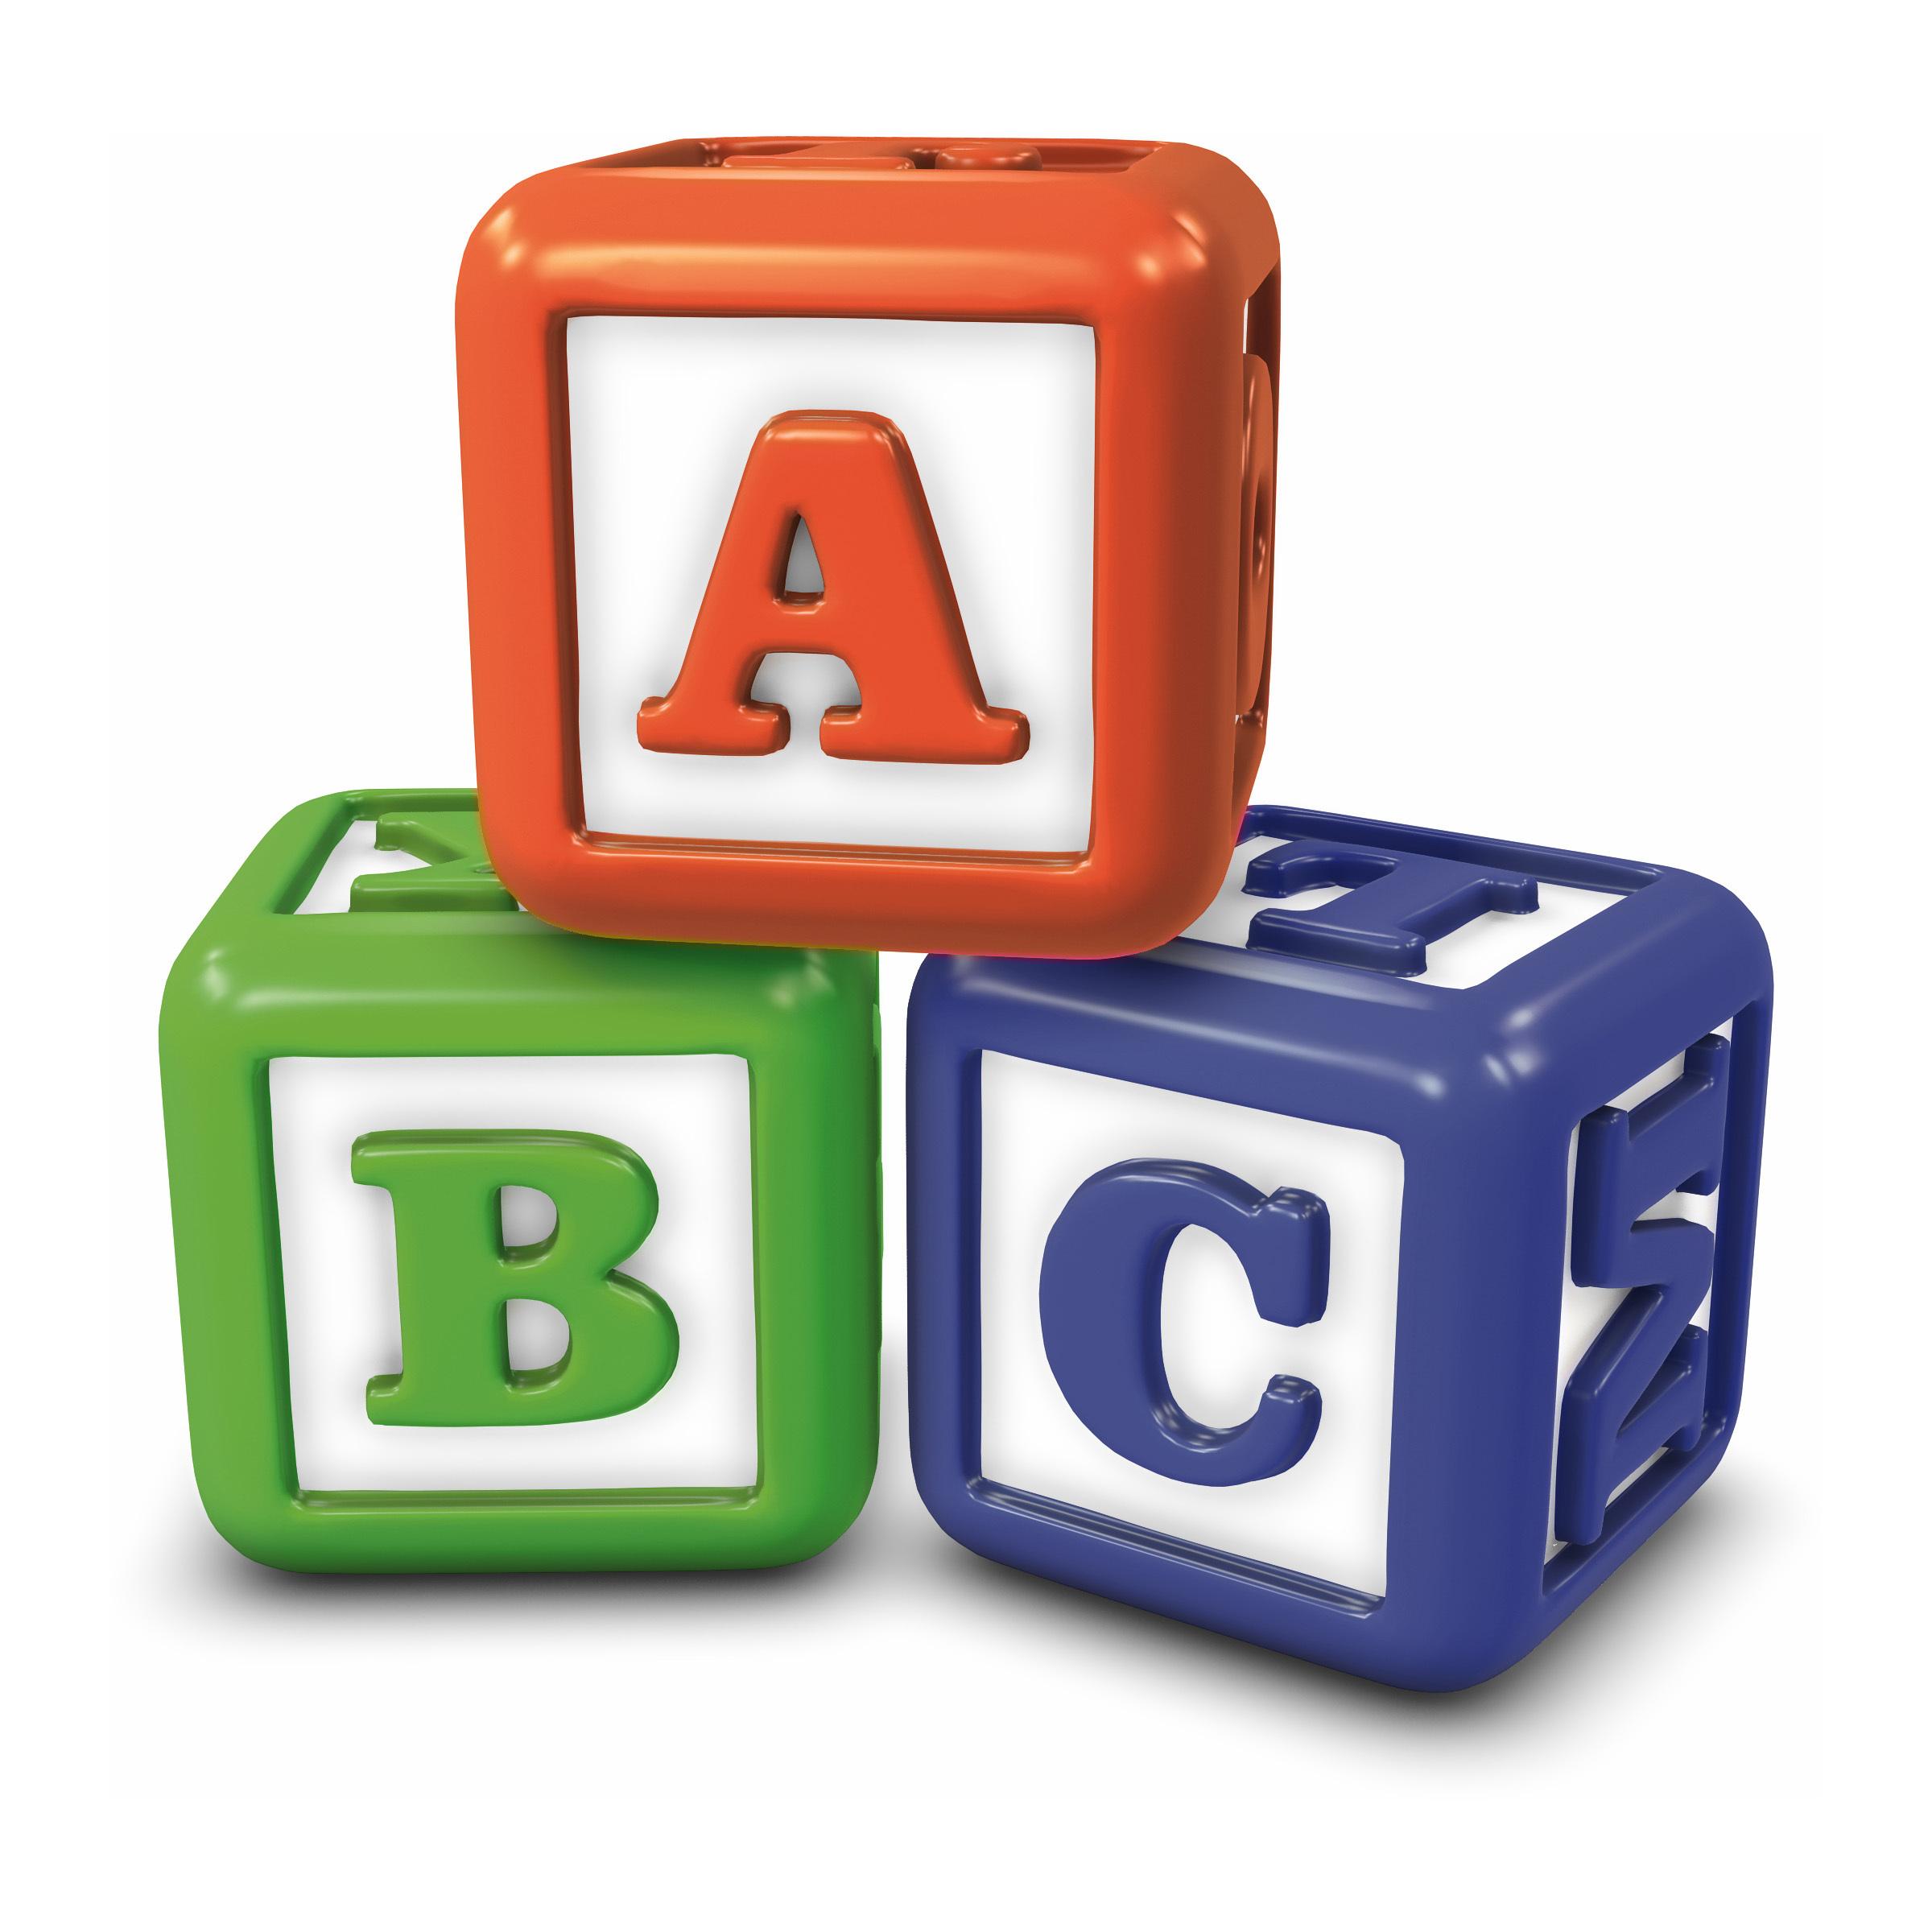 Abc blocks abc building blocks clipart clip art library